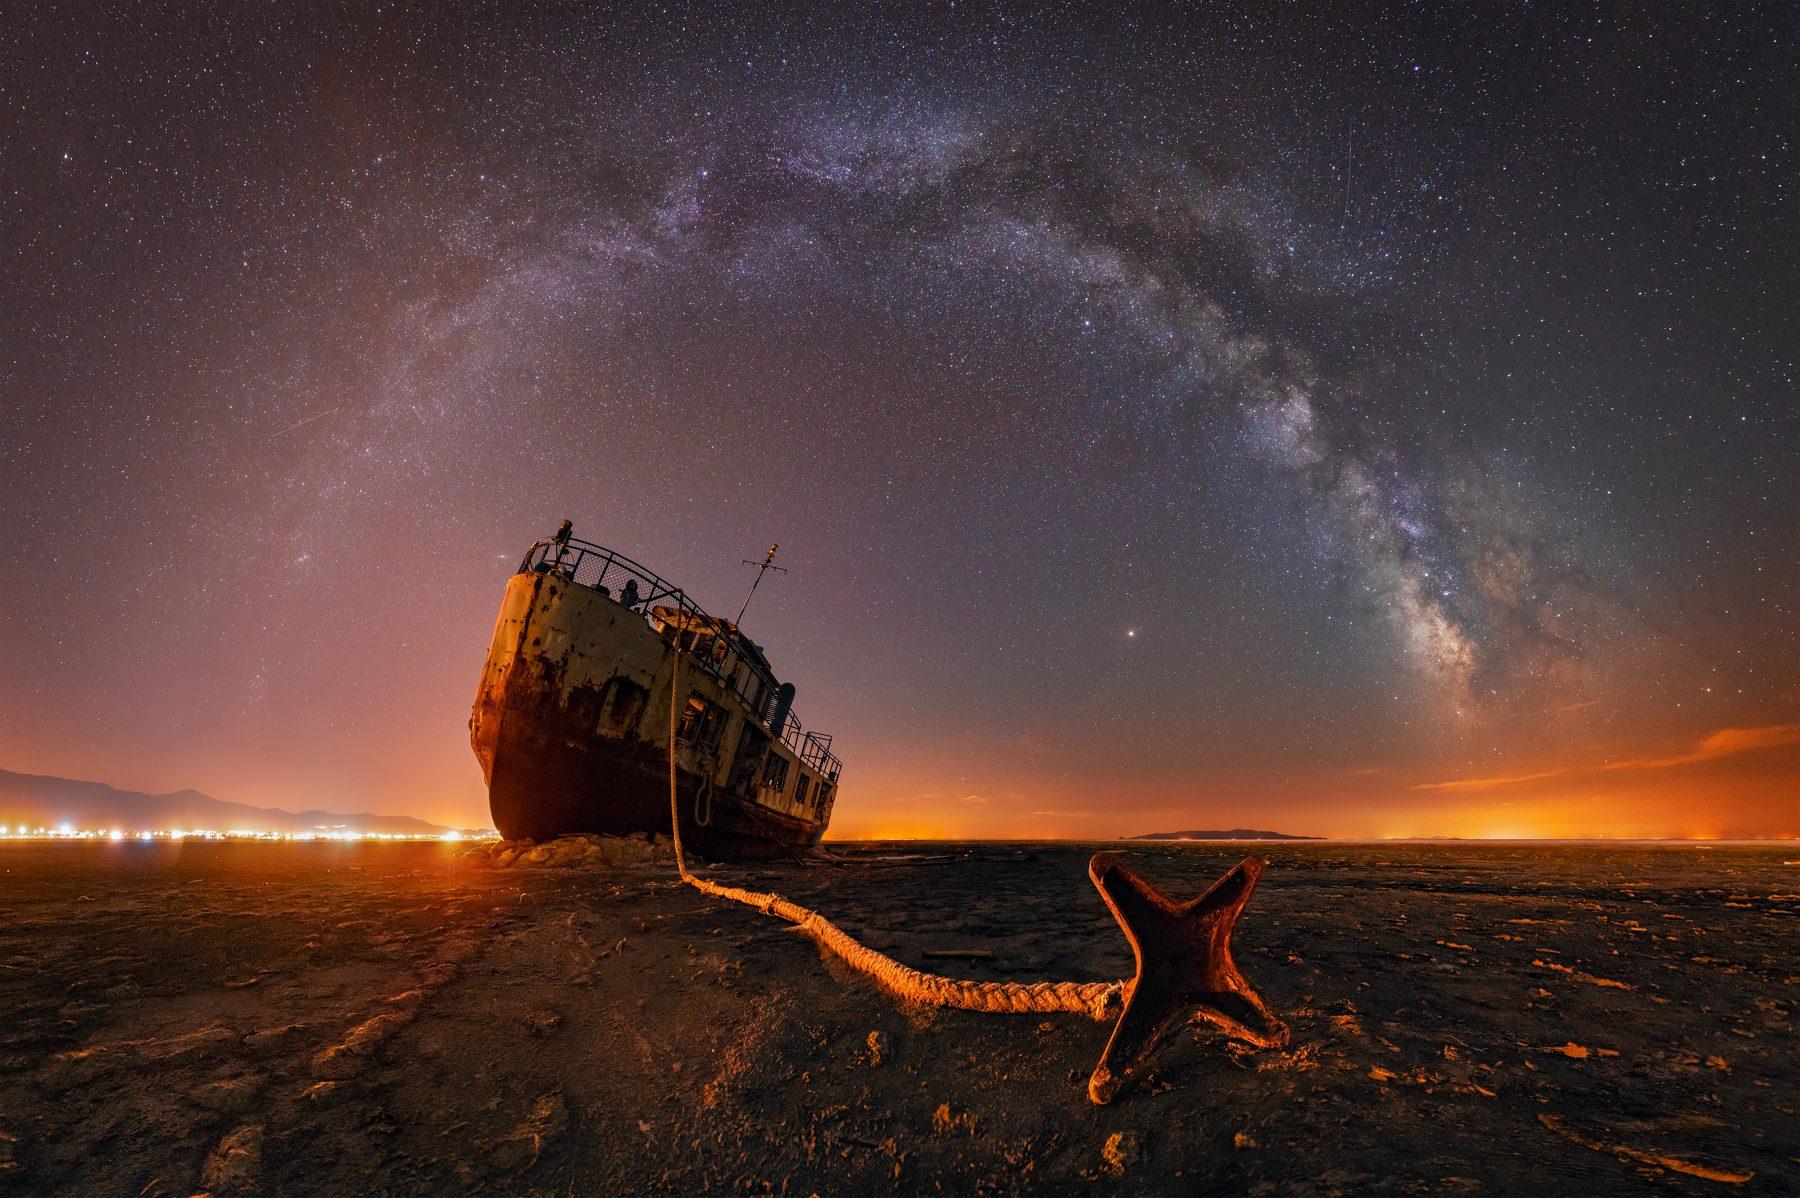 #shipe, #andscape, #nightscape, Ahmadzadeh Saeed